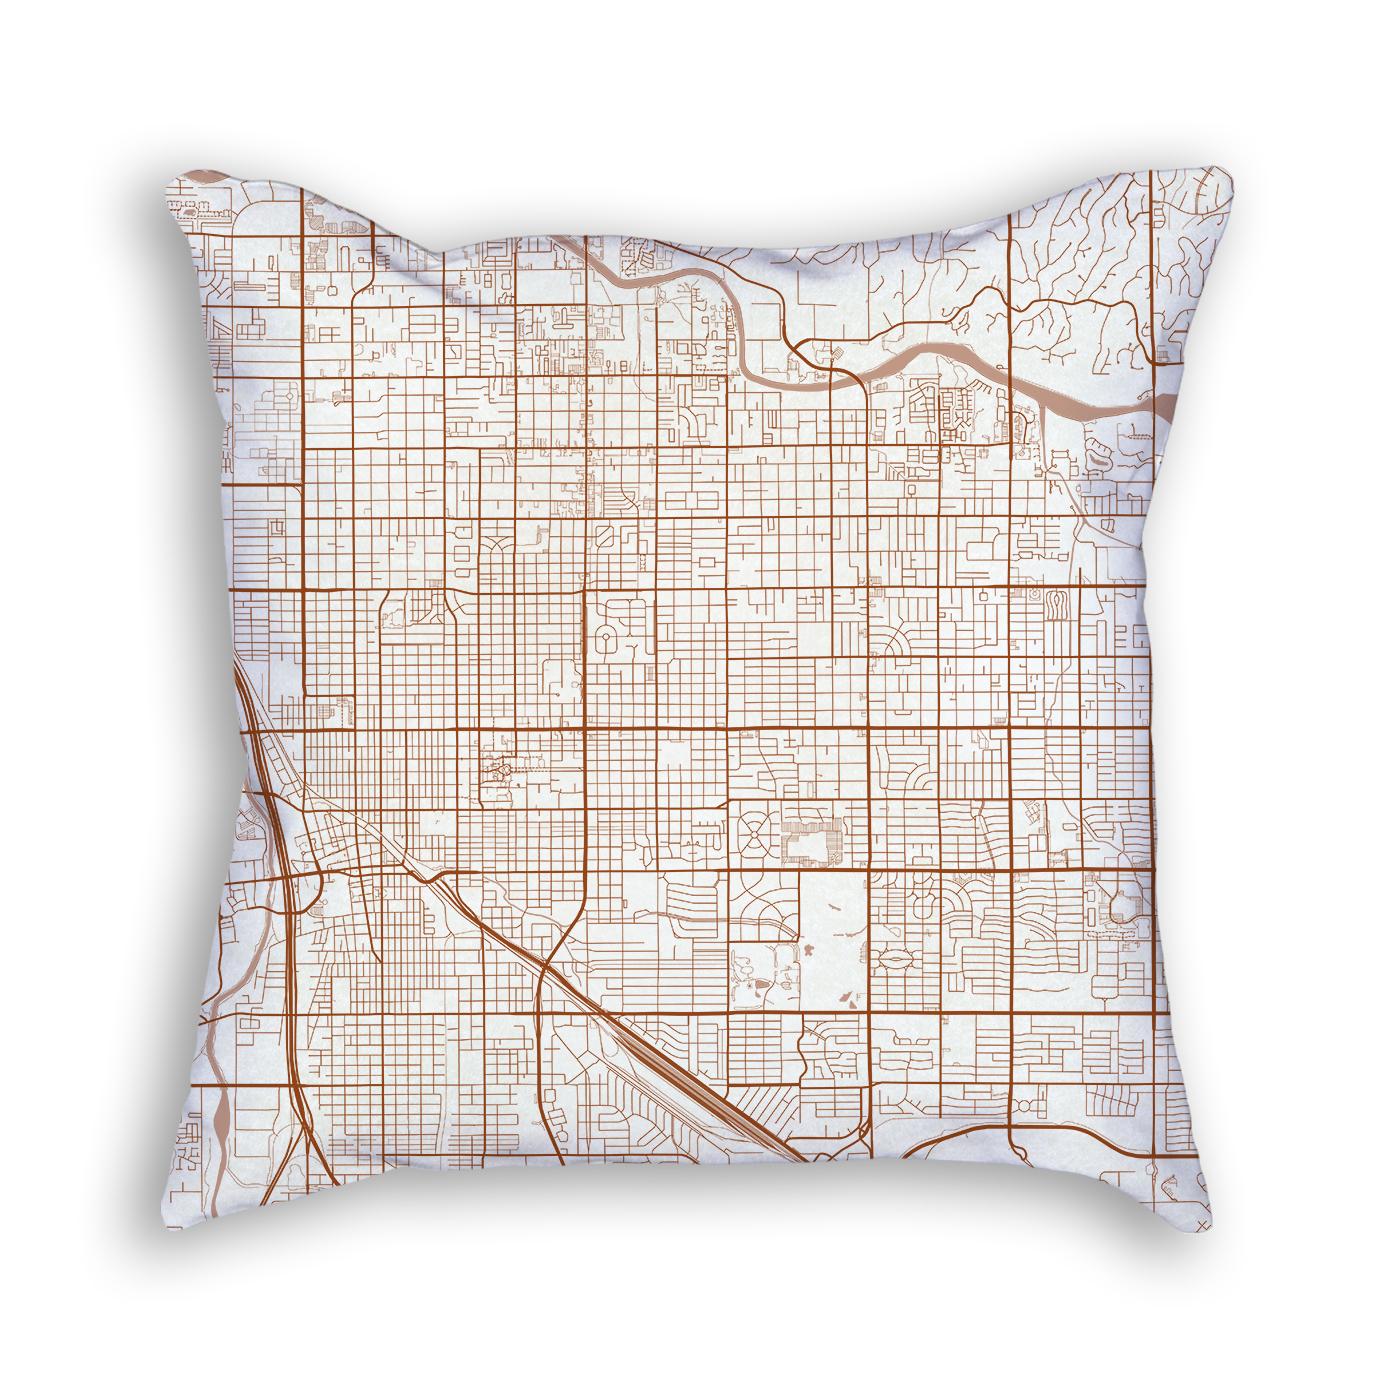 Tucson Arizona City Map Art Decorative Throw Pillow